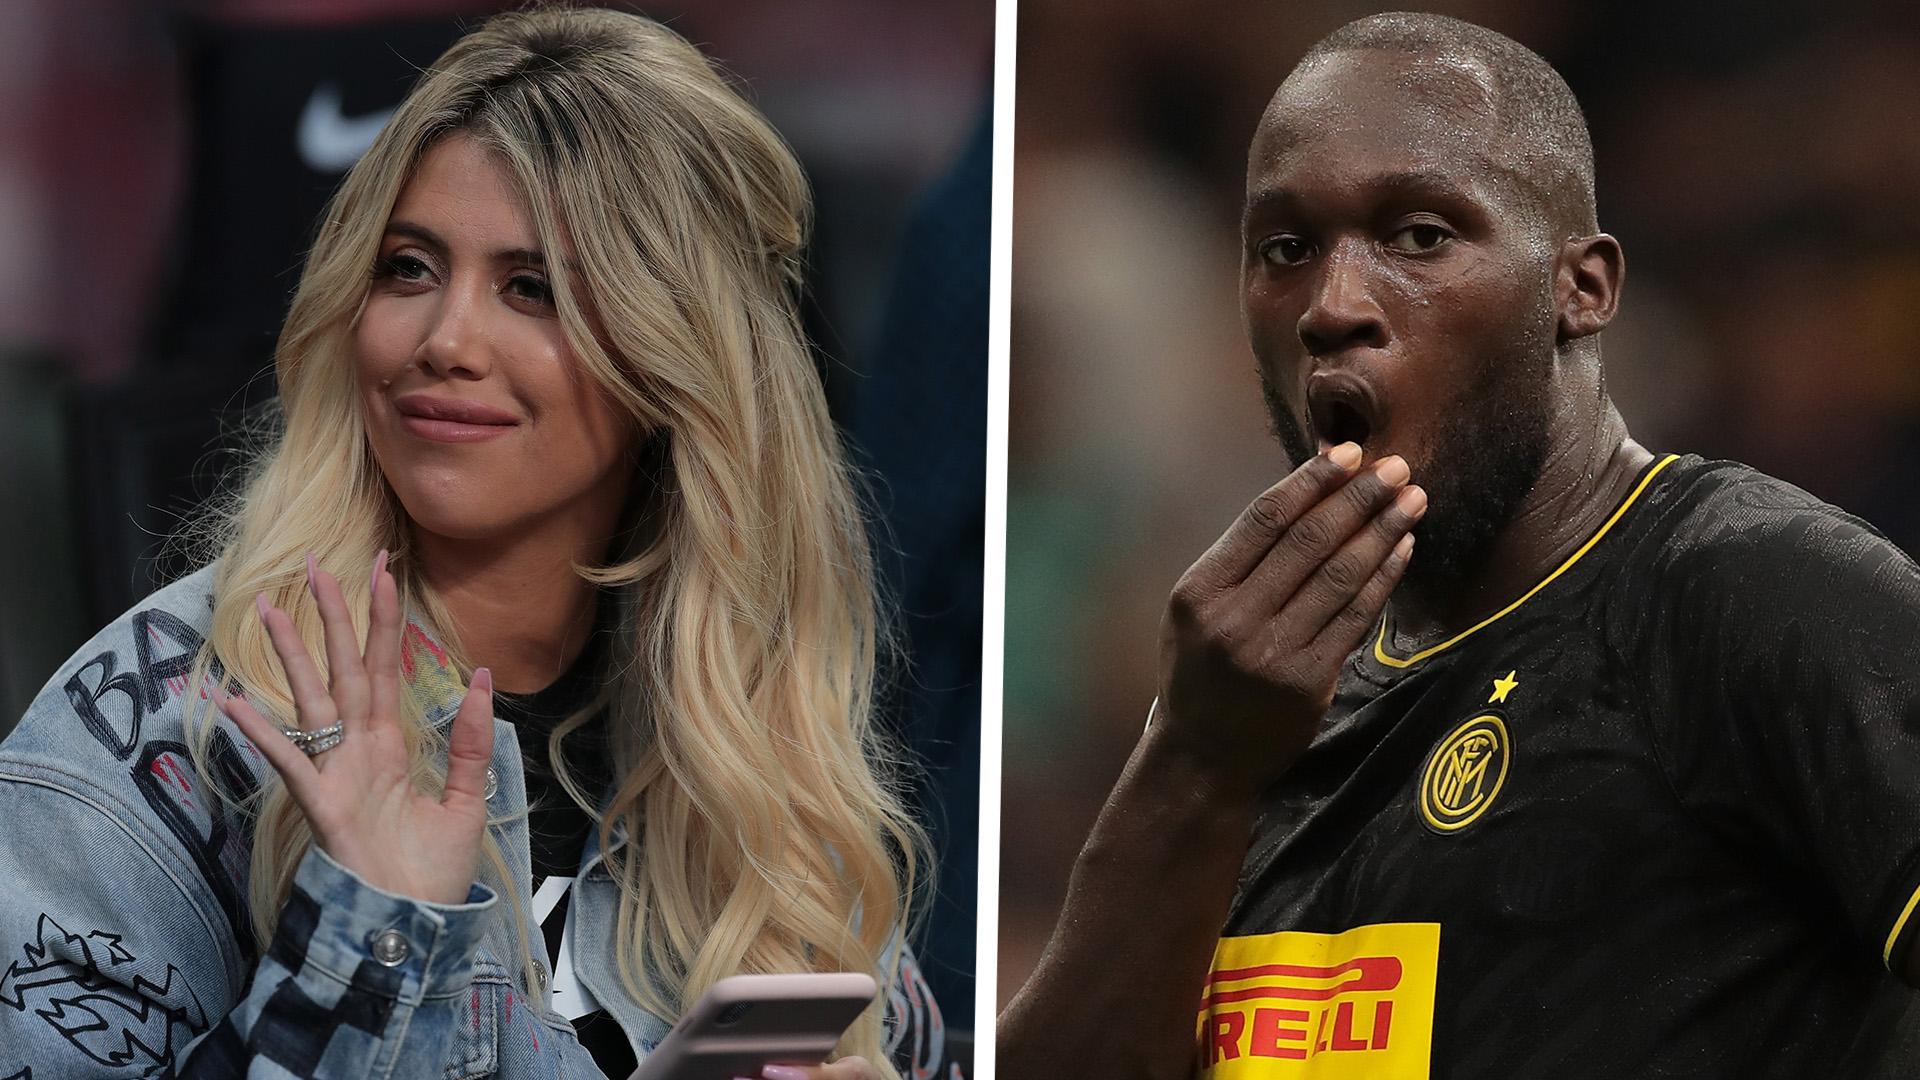 PSG : Lukaku ou Icardi, Wanda Nara sort ses griffes !